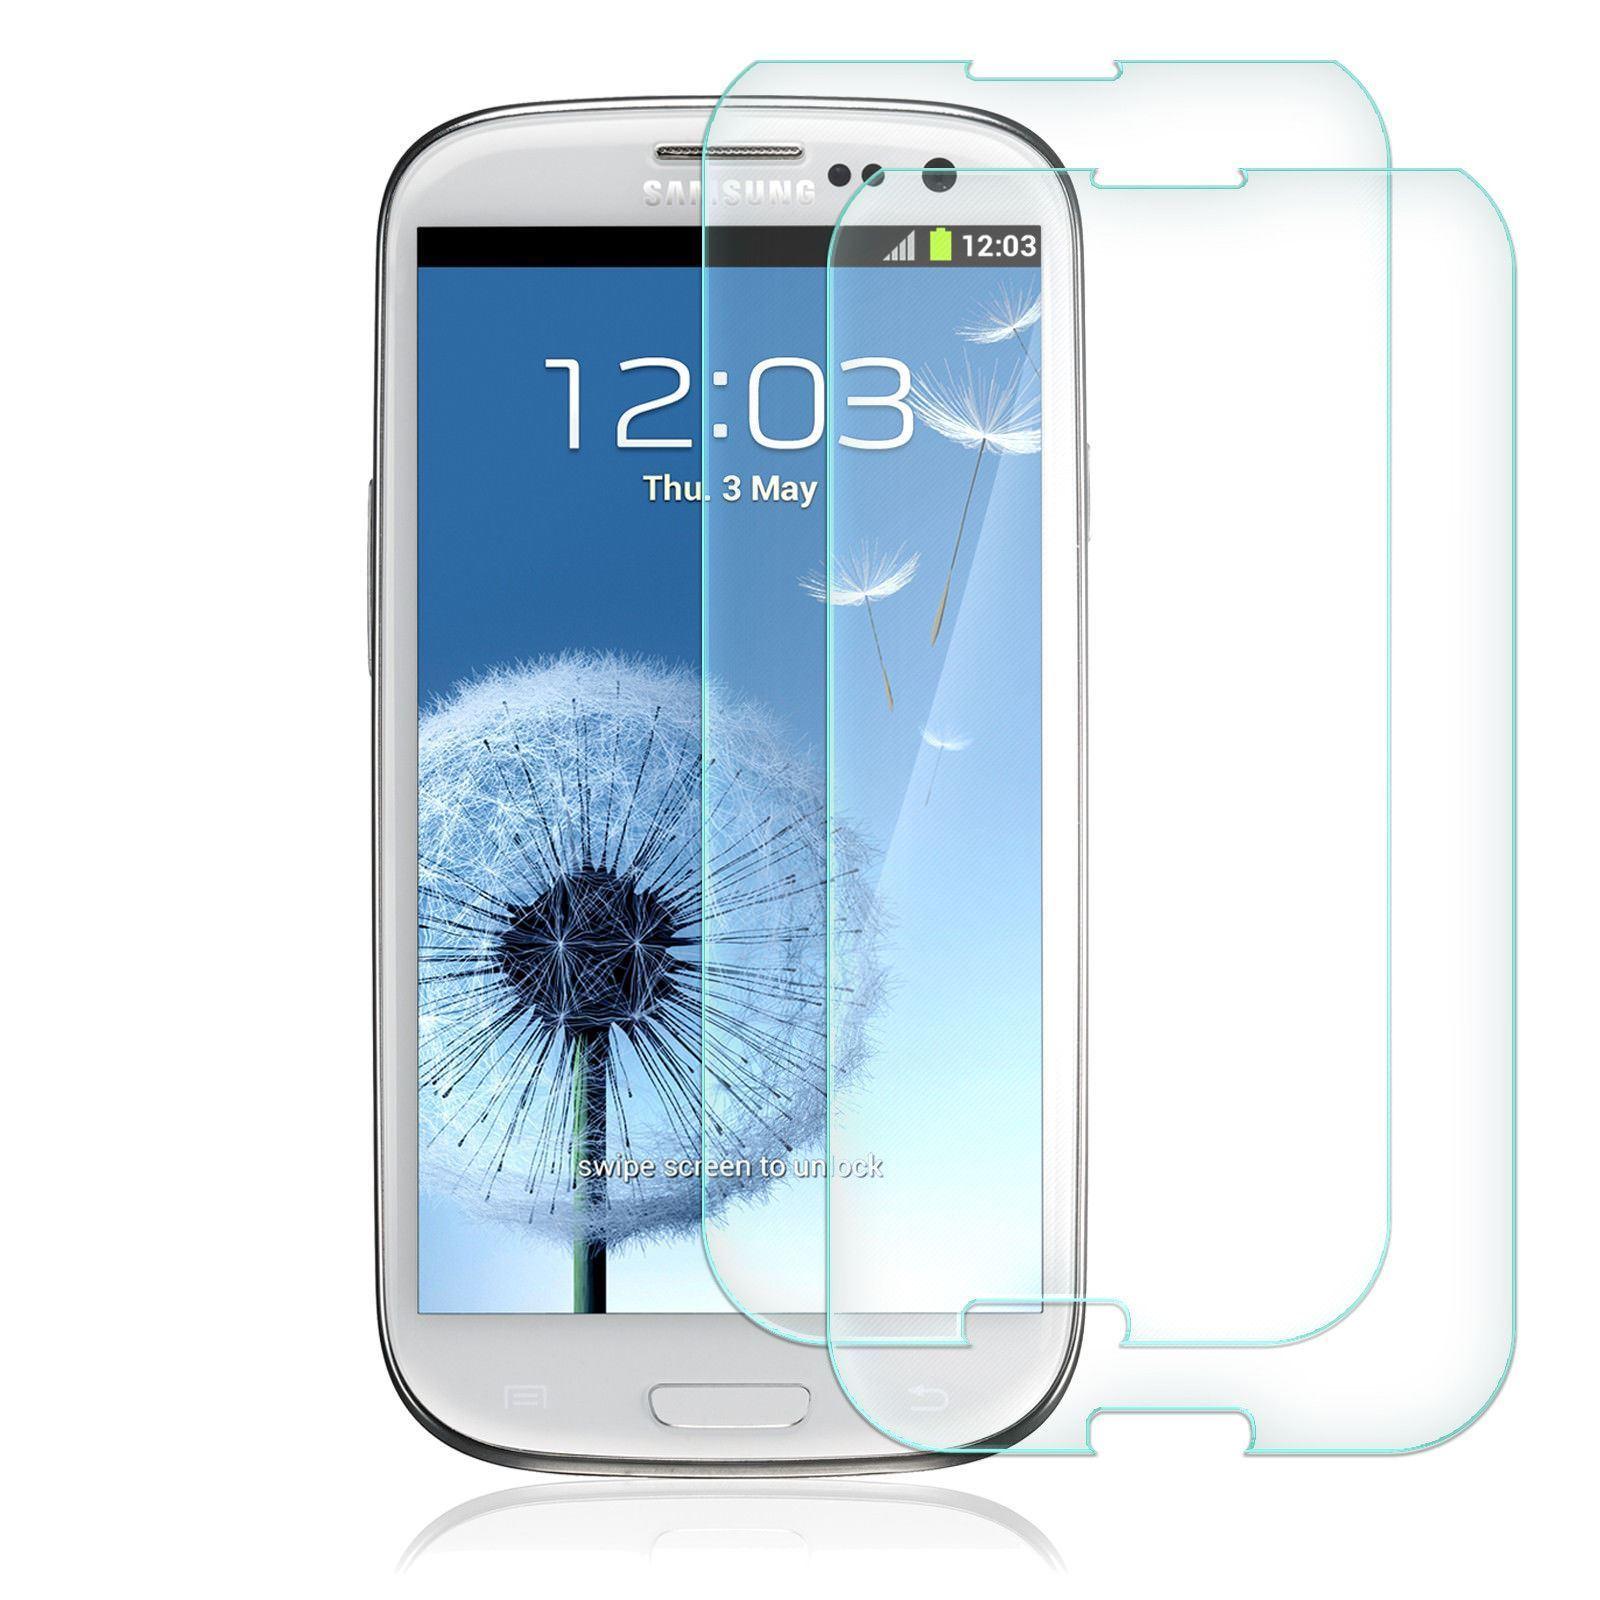 2x-Protector-Cristal-Templado-Para-Samsung-Galaxy-S3-S3-Mini-S5-S6-S7